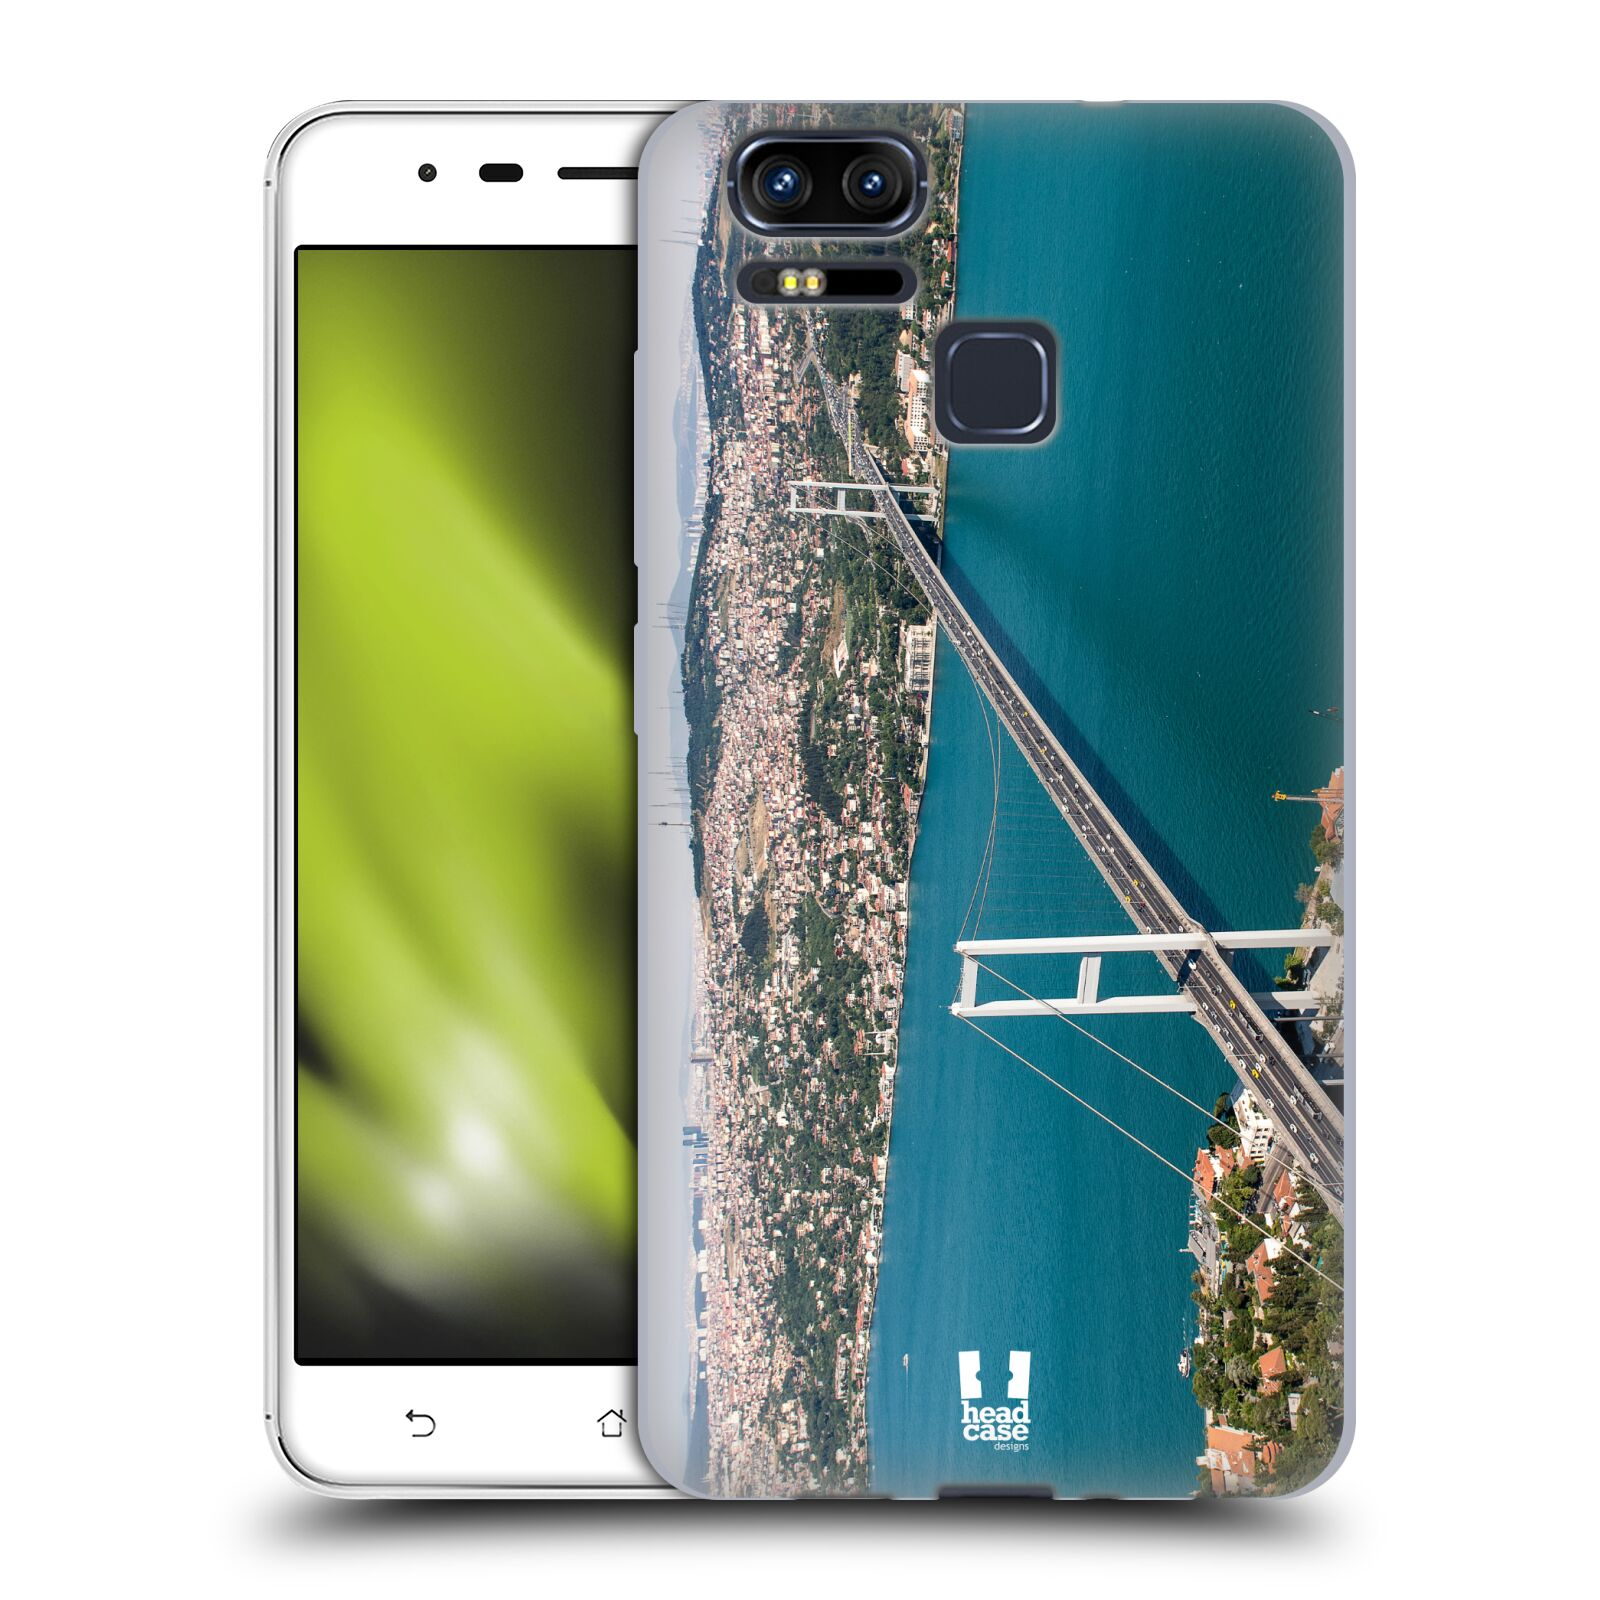 HEAD-CASE-DESIGNS-BEST-OF-ISTANBUL-SOFT-GEL-CASE-FOR-ASUS-ZENFONE-3-ZOOM-ZE553KL